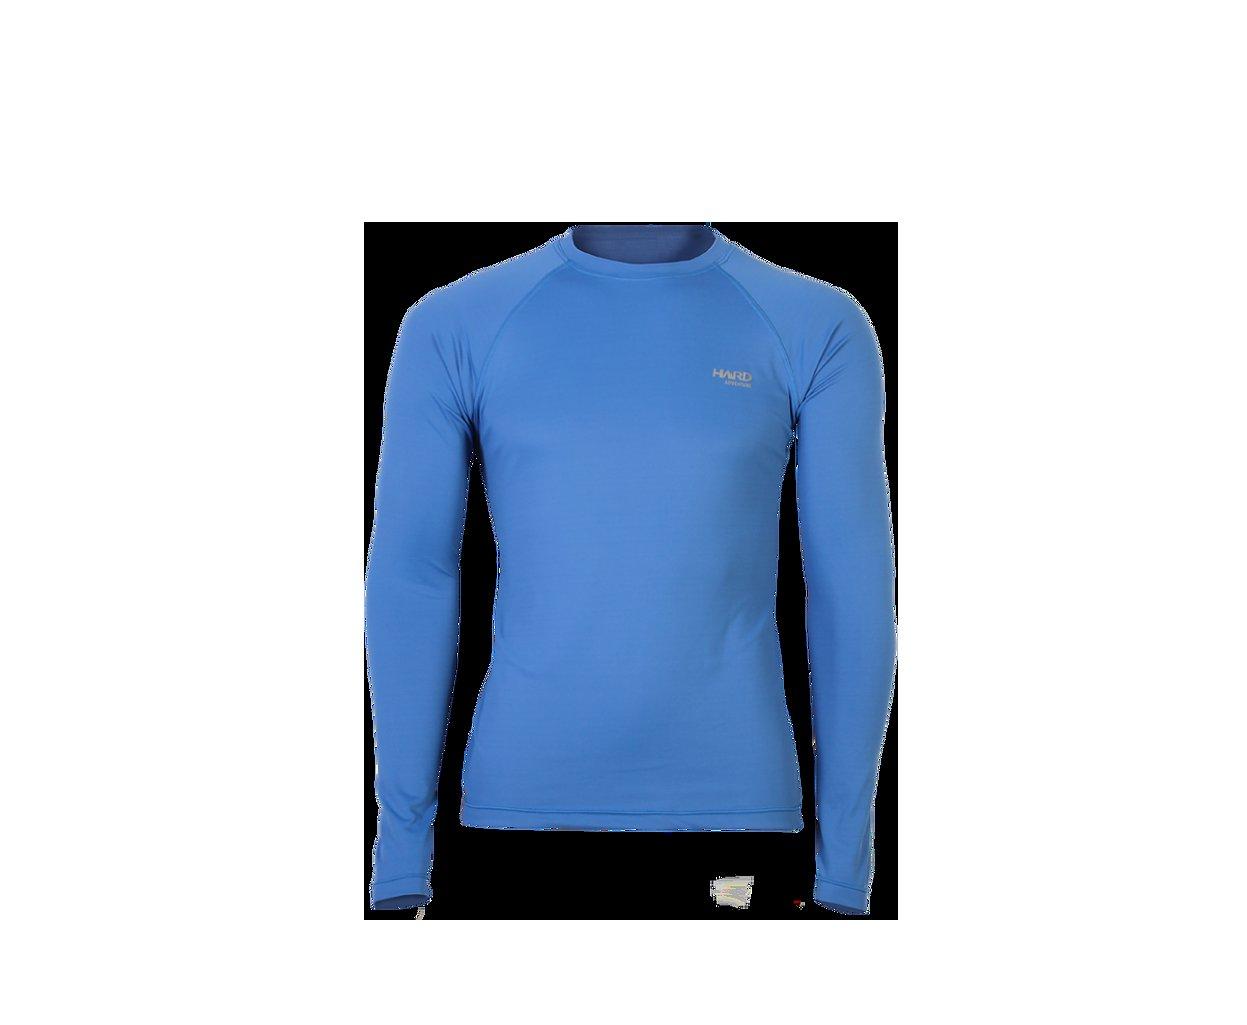 Camiseta Uvblock Masculina Ml - Azul Novo Anil - Hard